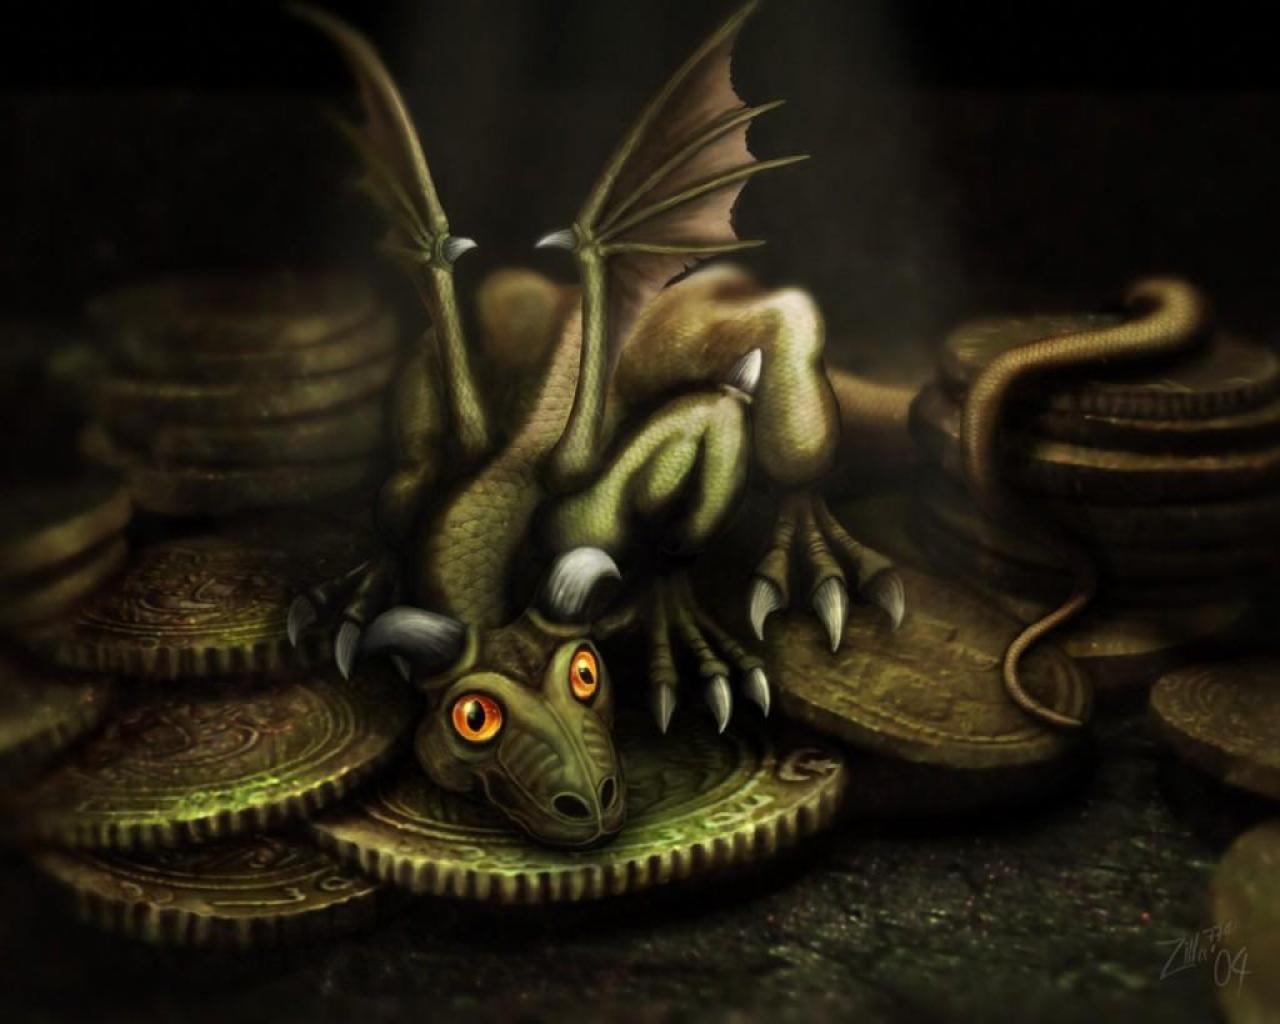 Dragon  Fantasy Wallpaper 35338248 Fanpop